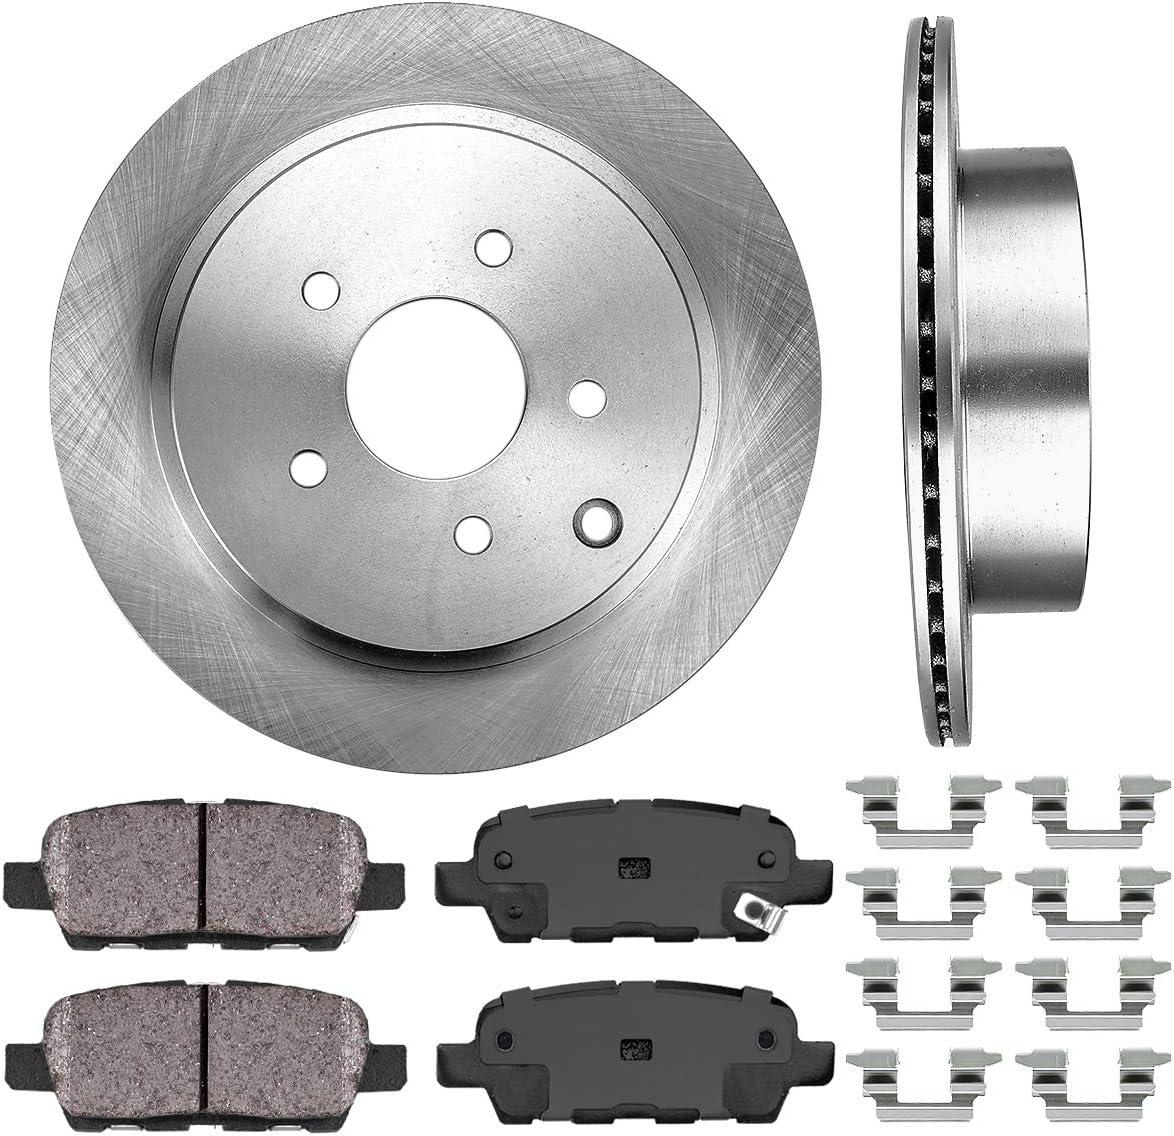 Rear Drilled Slotted Brake Rotors /& Ceramic Pads For Infiniti M35h M37 M37X M56